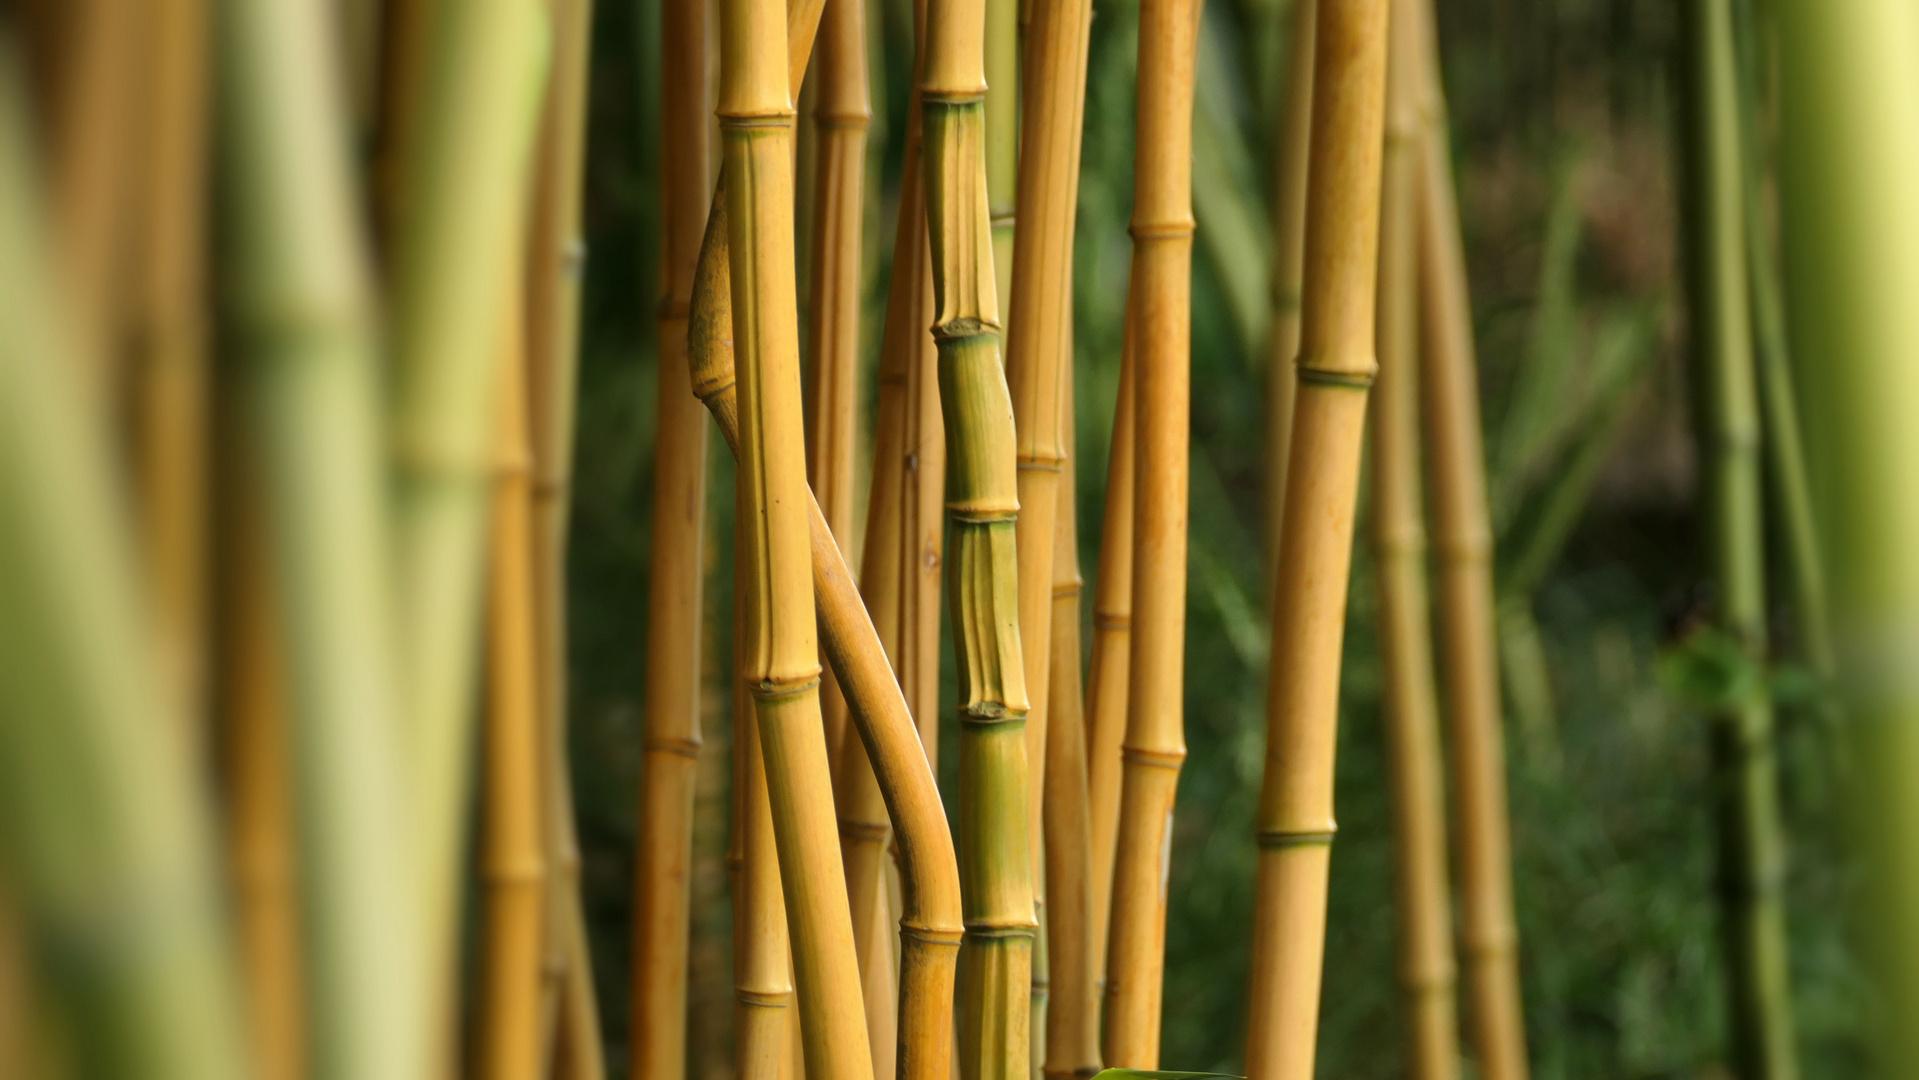 ... just bamboo